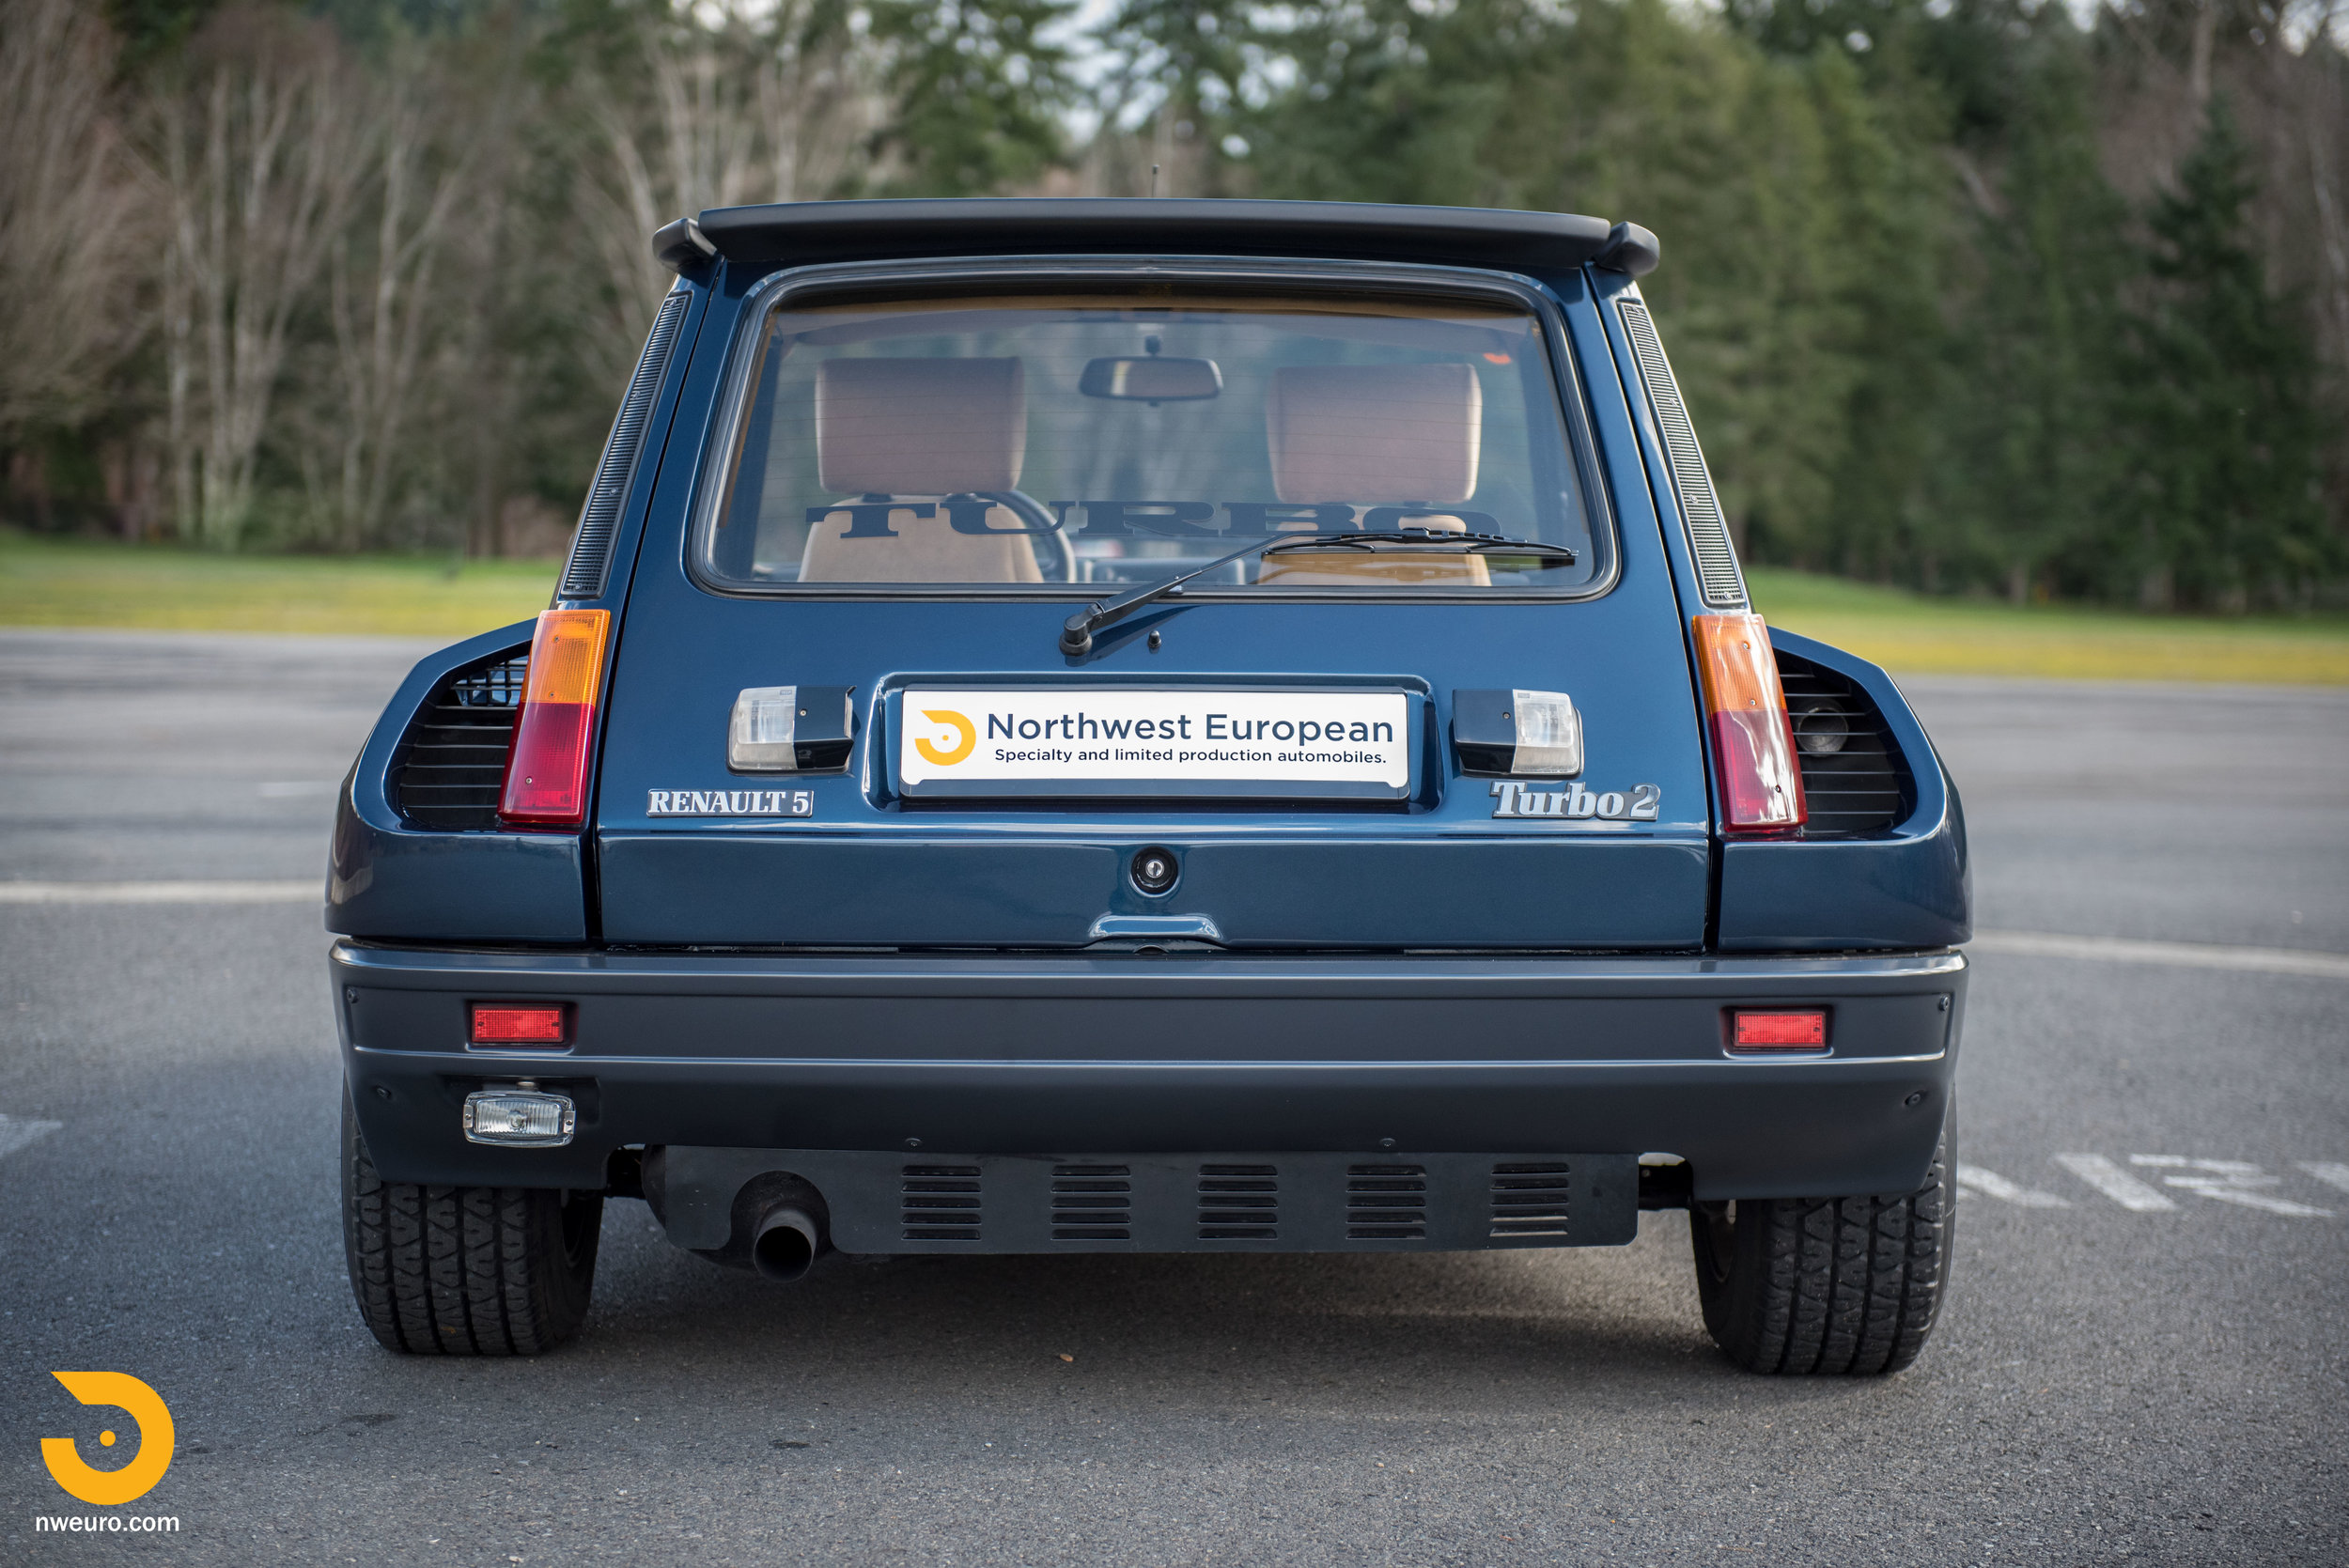 1983 Renault R5 Turbo 2-32.jpg